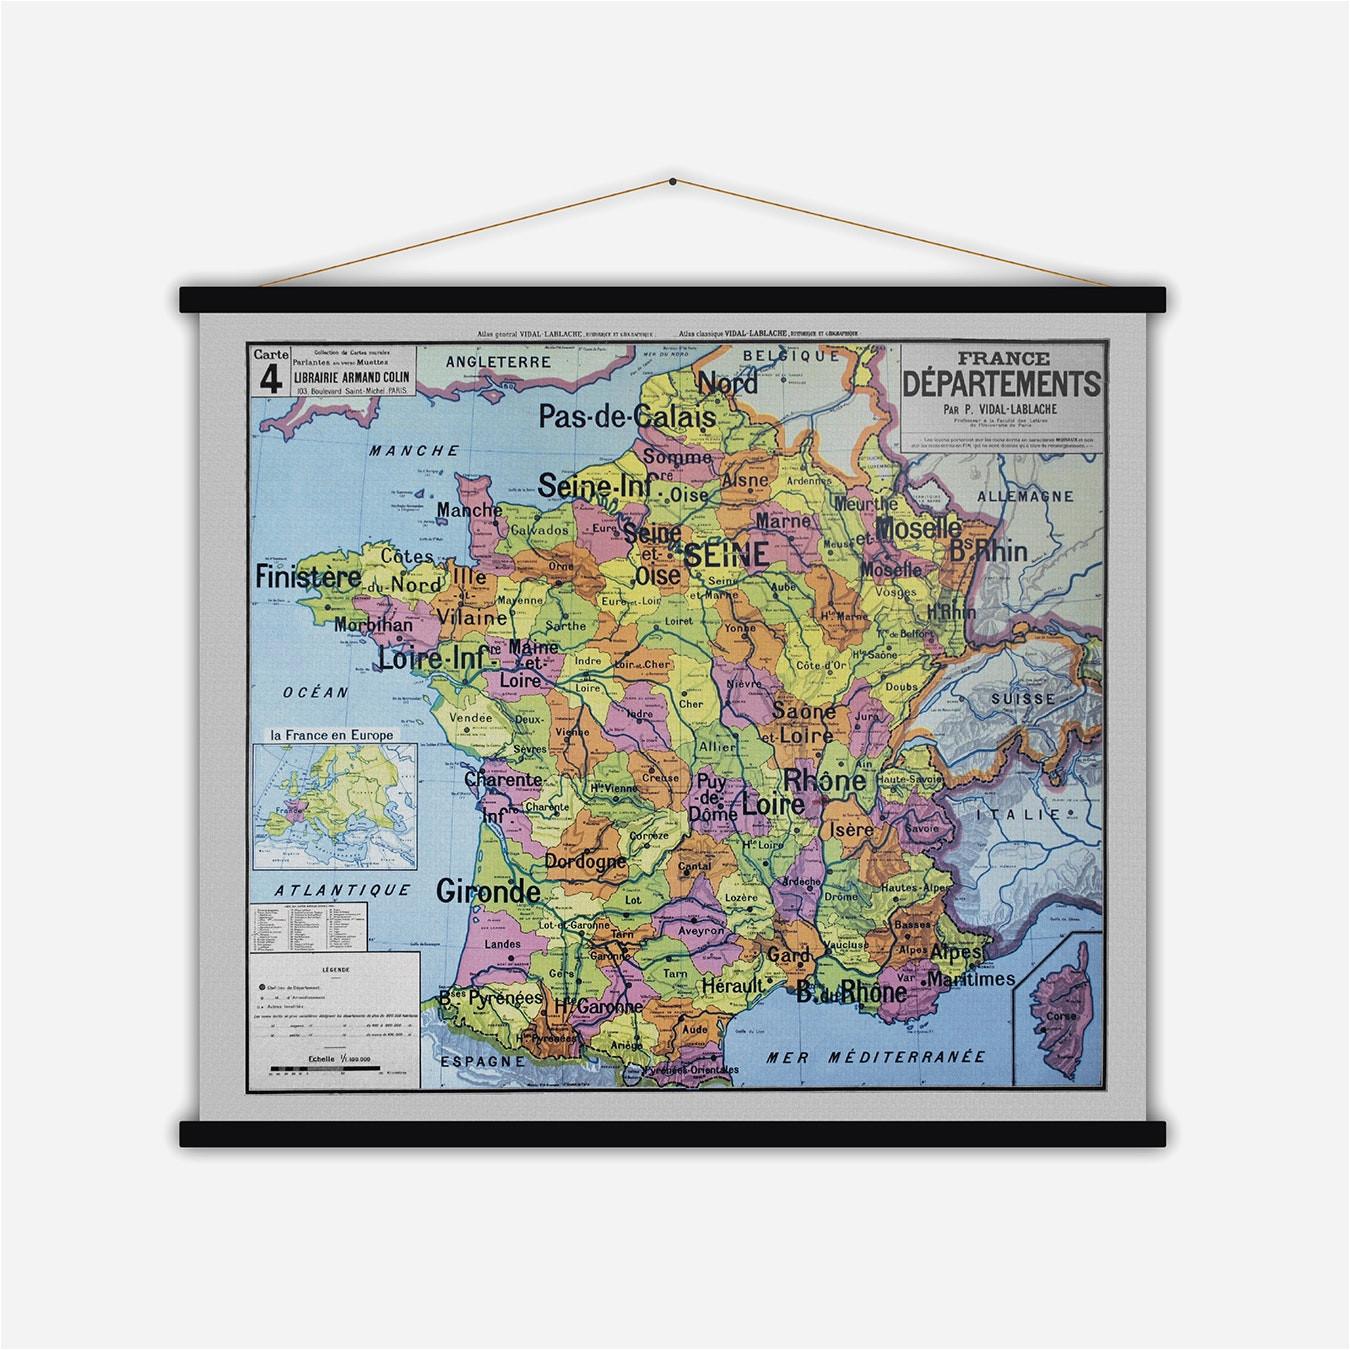 Maps Of France to Buy France Departements Vintage Map